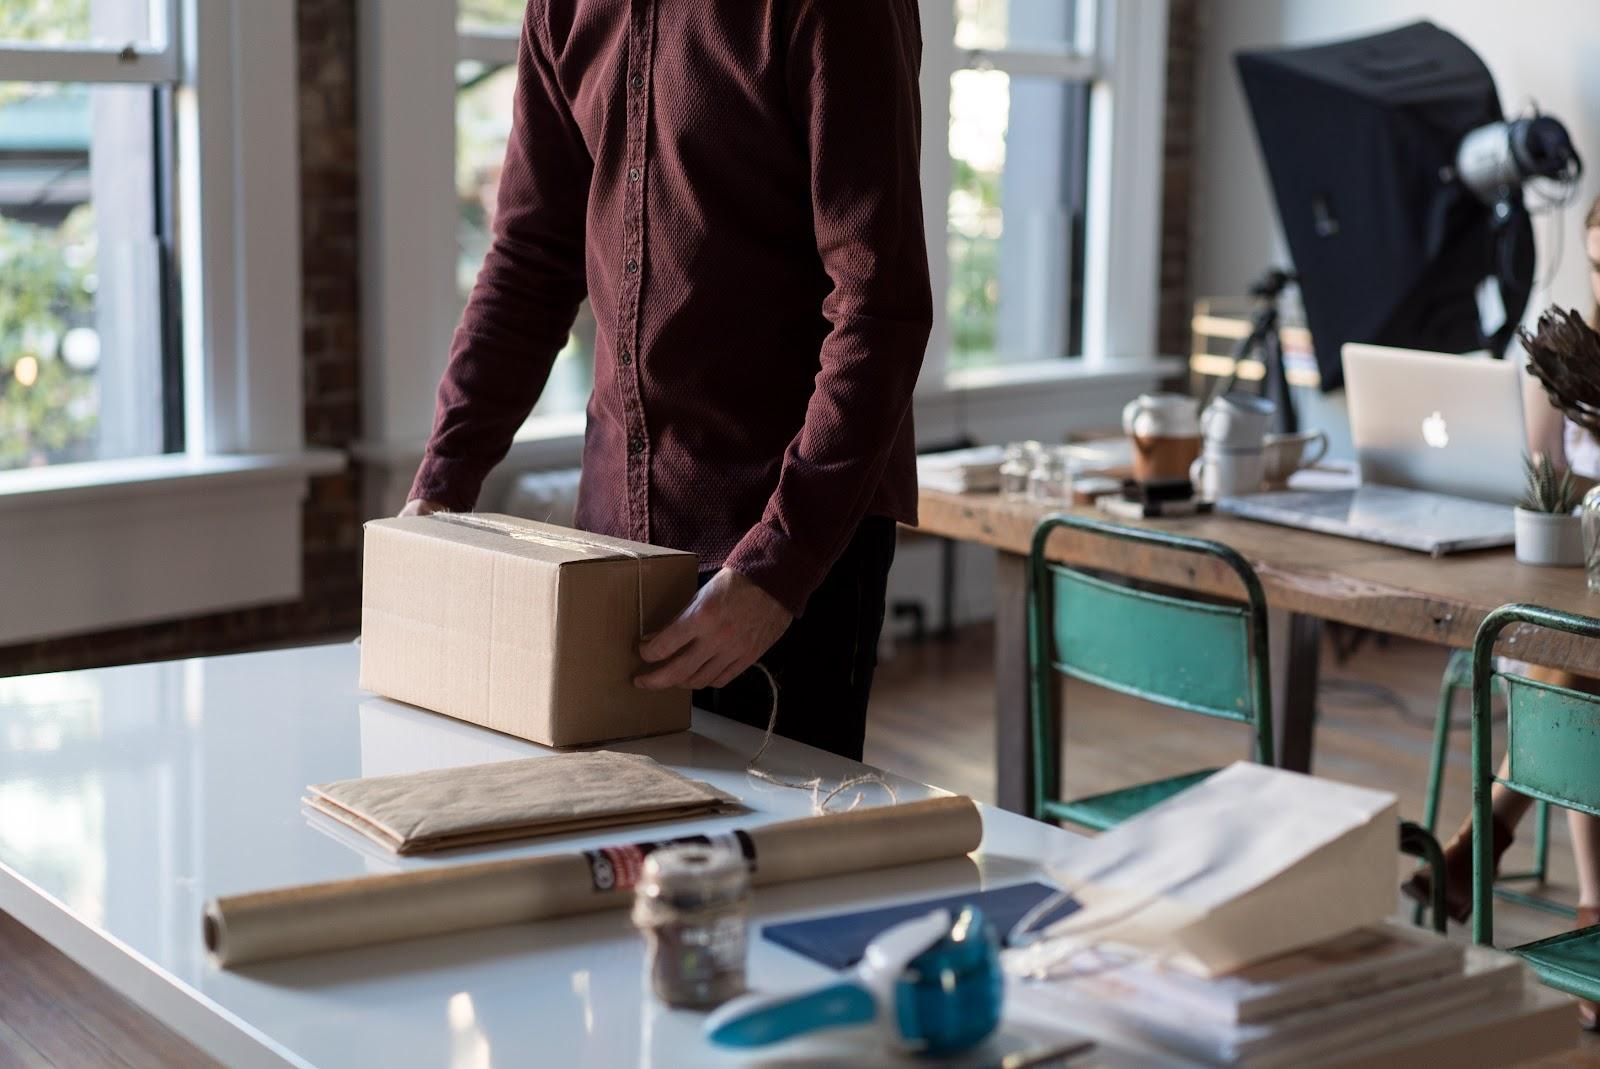 Man in office wraps a cardboard box